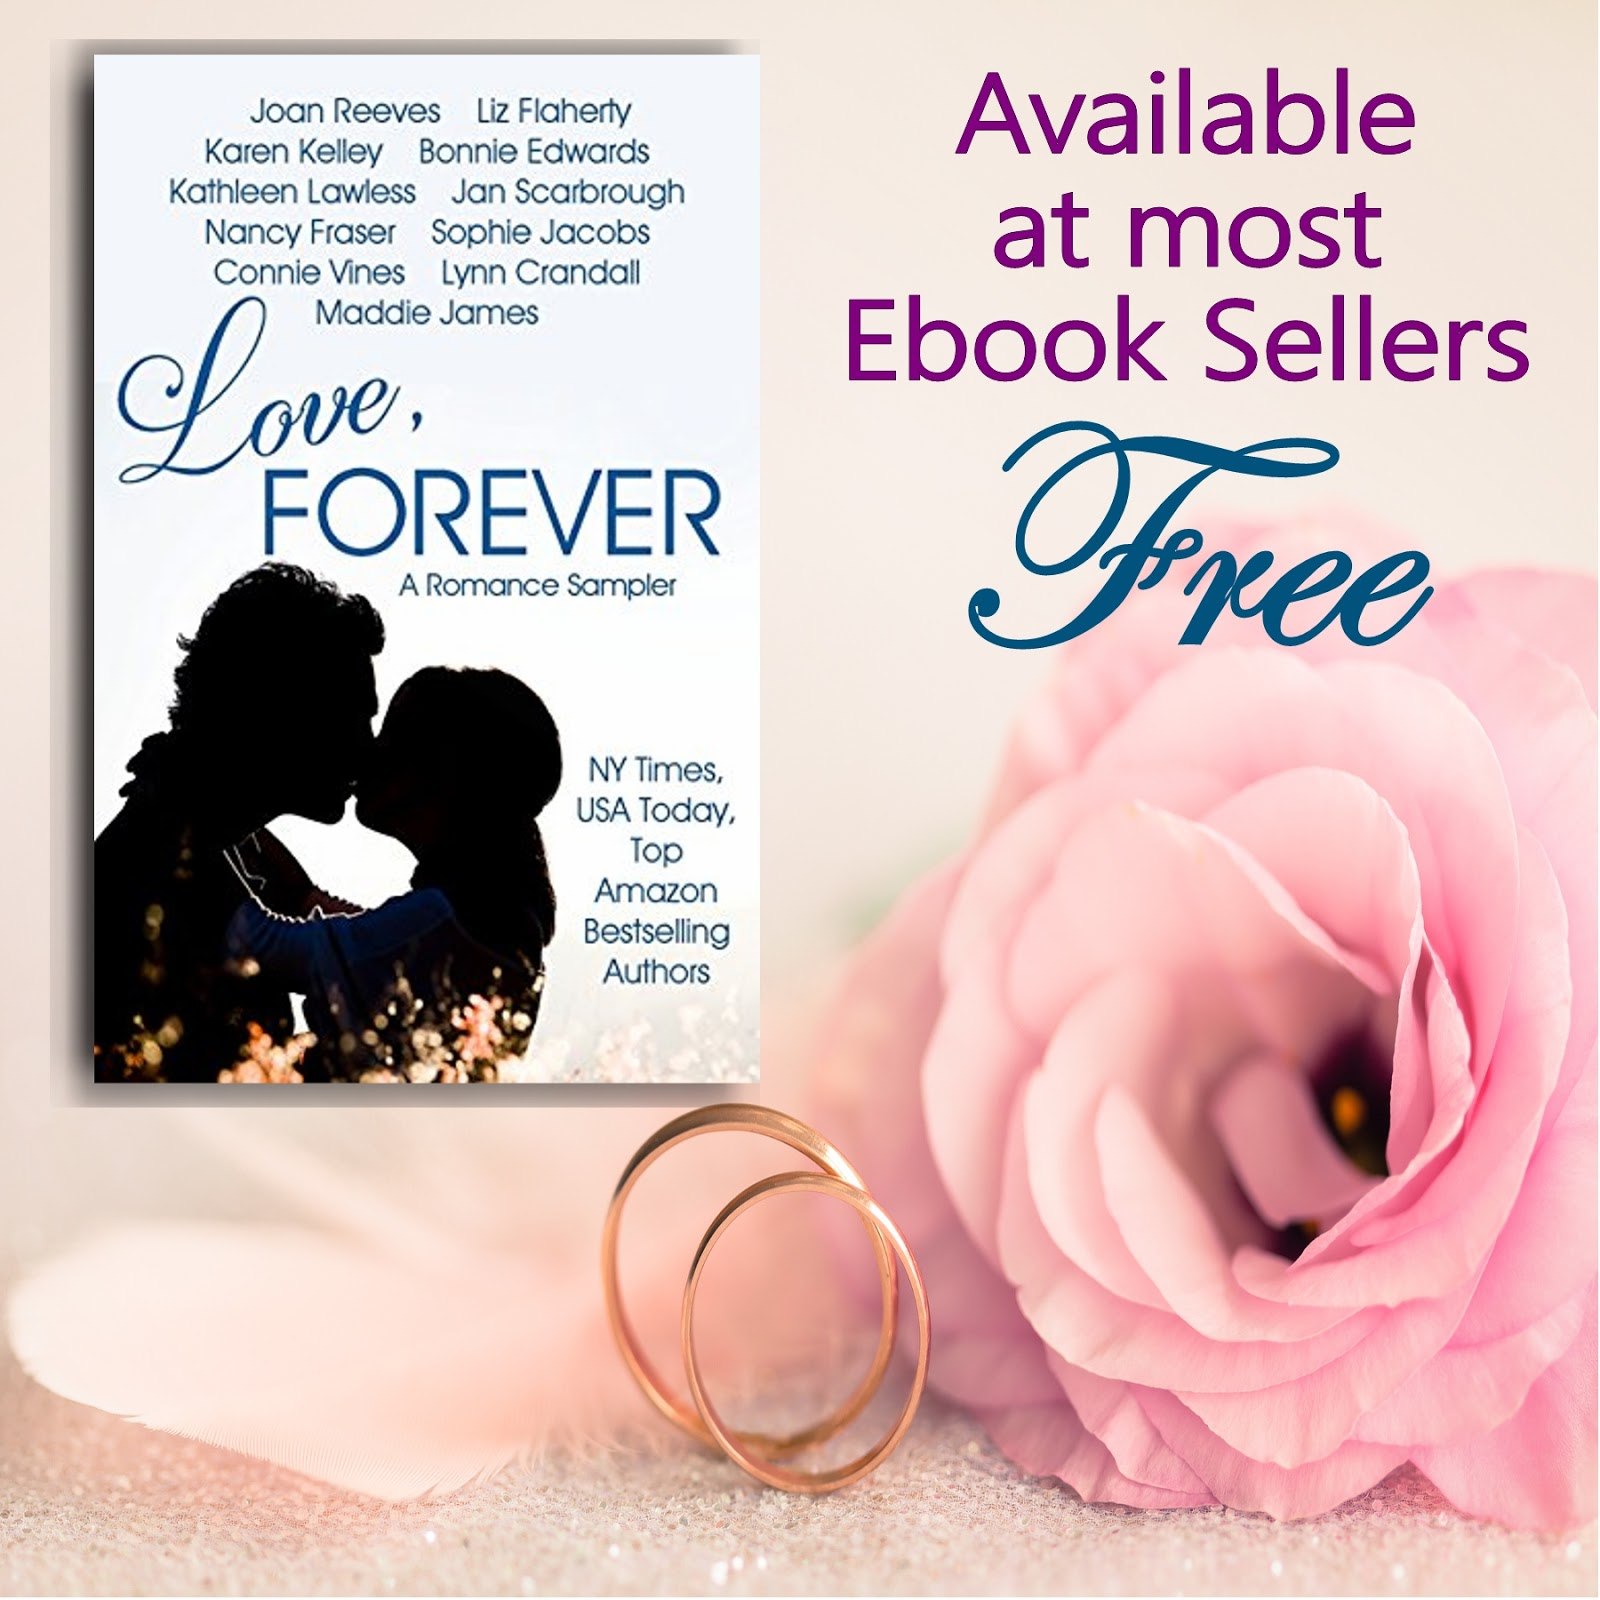 Joan Reeves: Free! New Romance Sampler